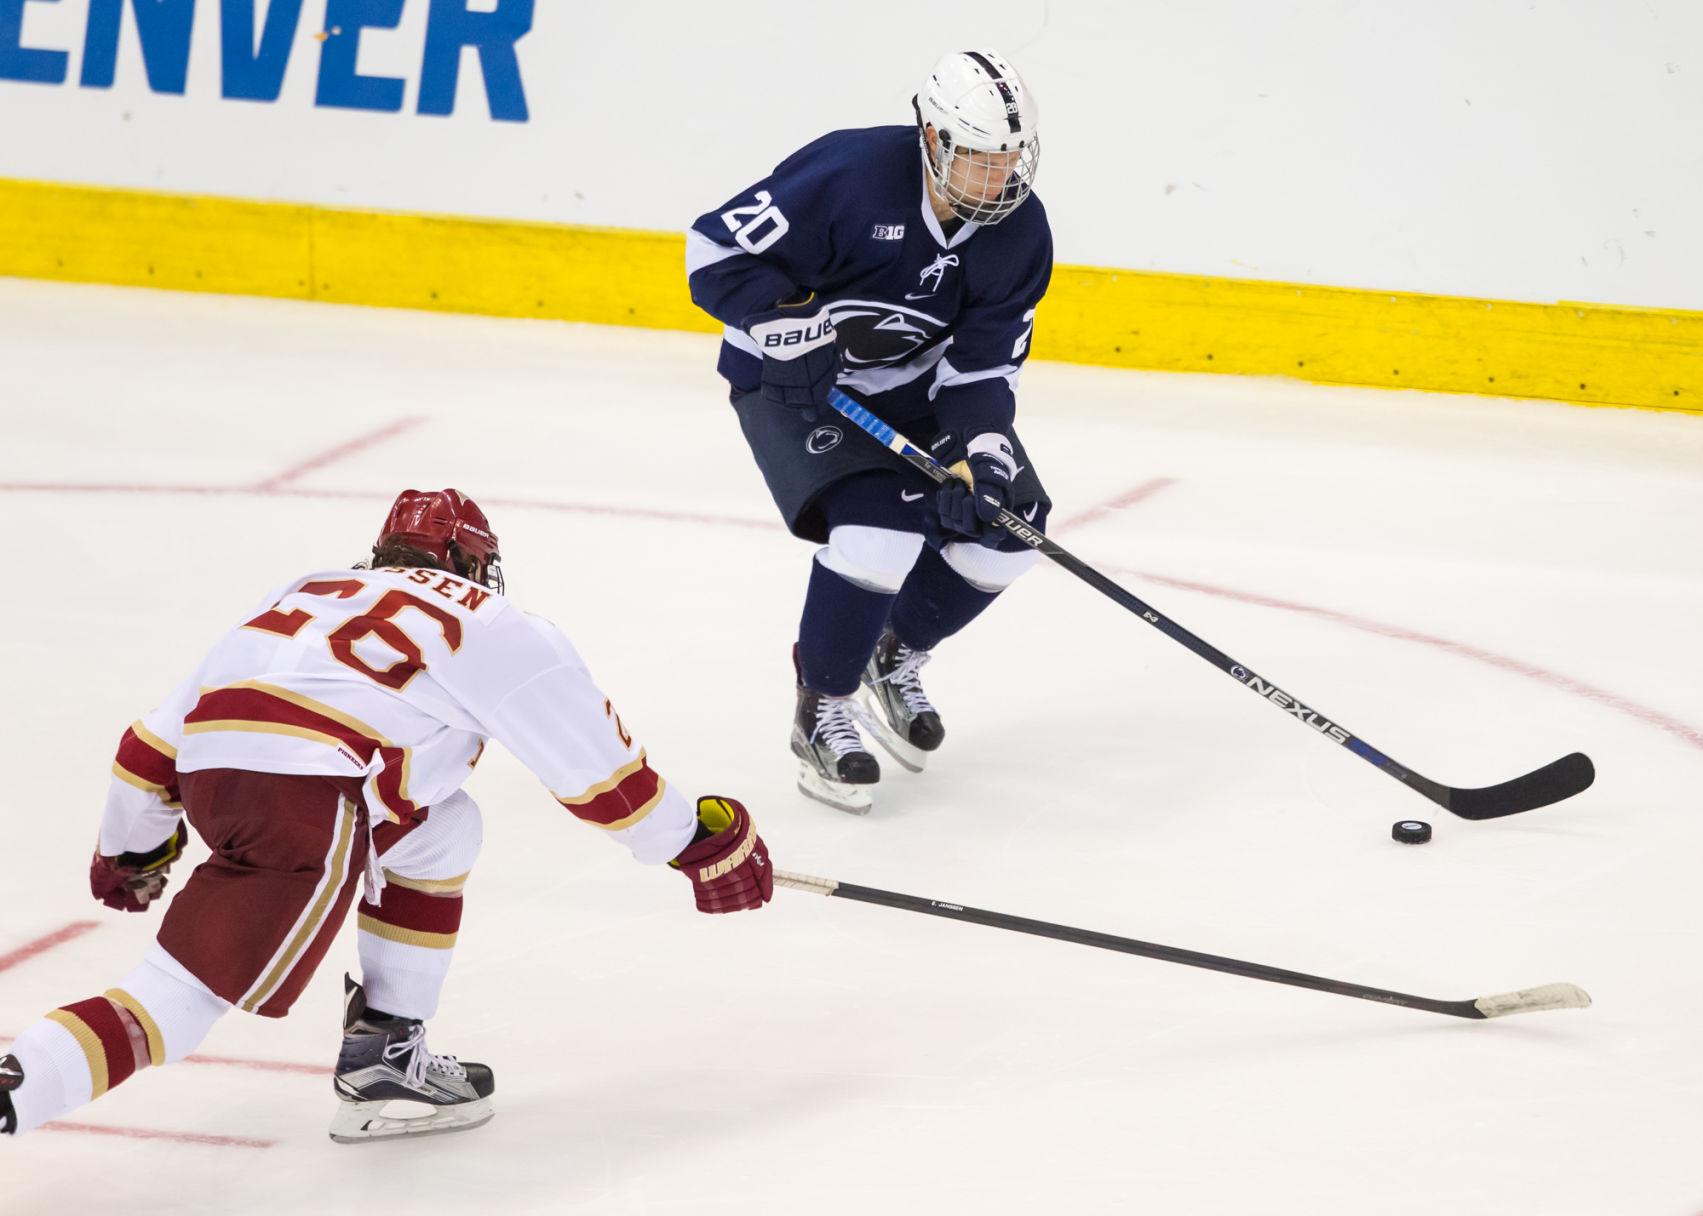 NCAA Tournament: Can Penn State Men's Hockey Take Down Powerhouse Denver?